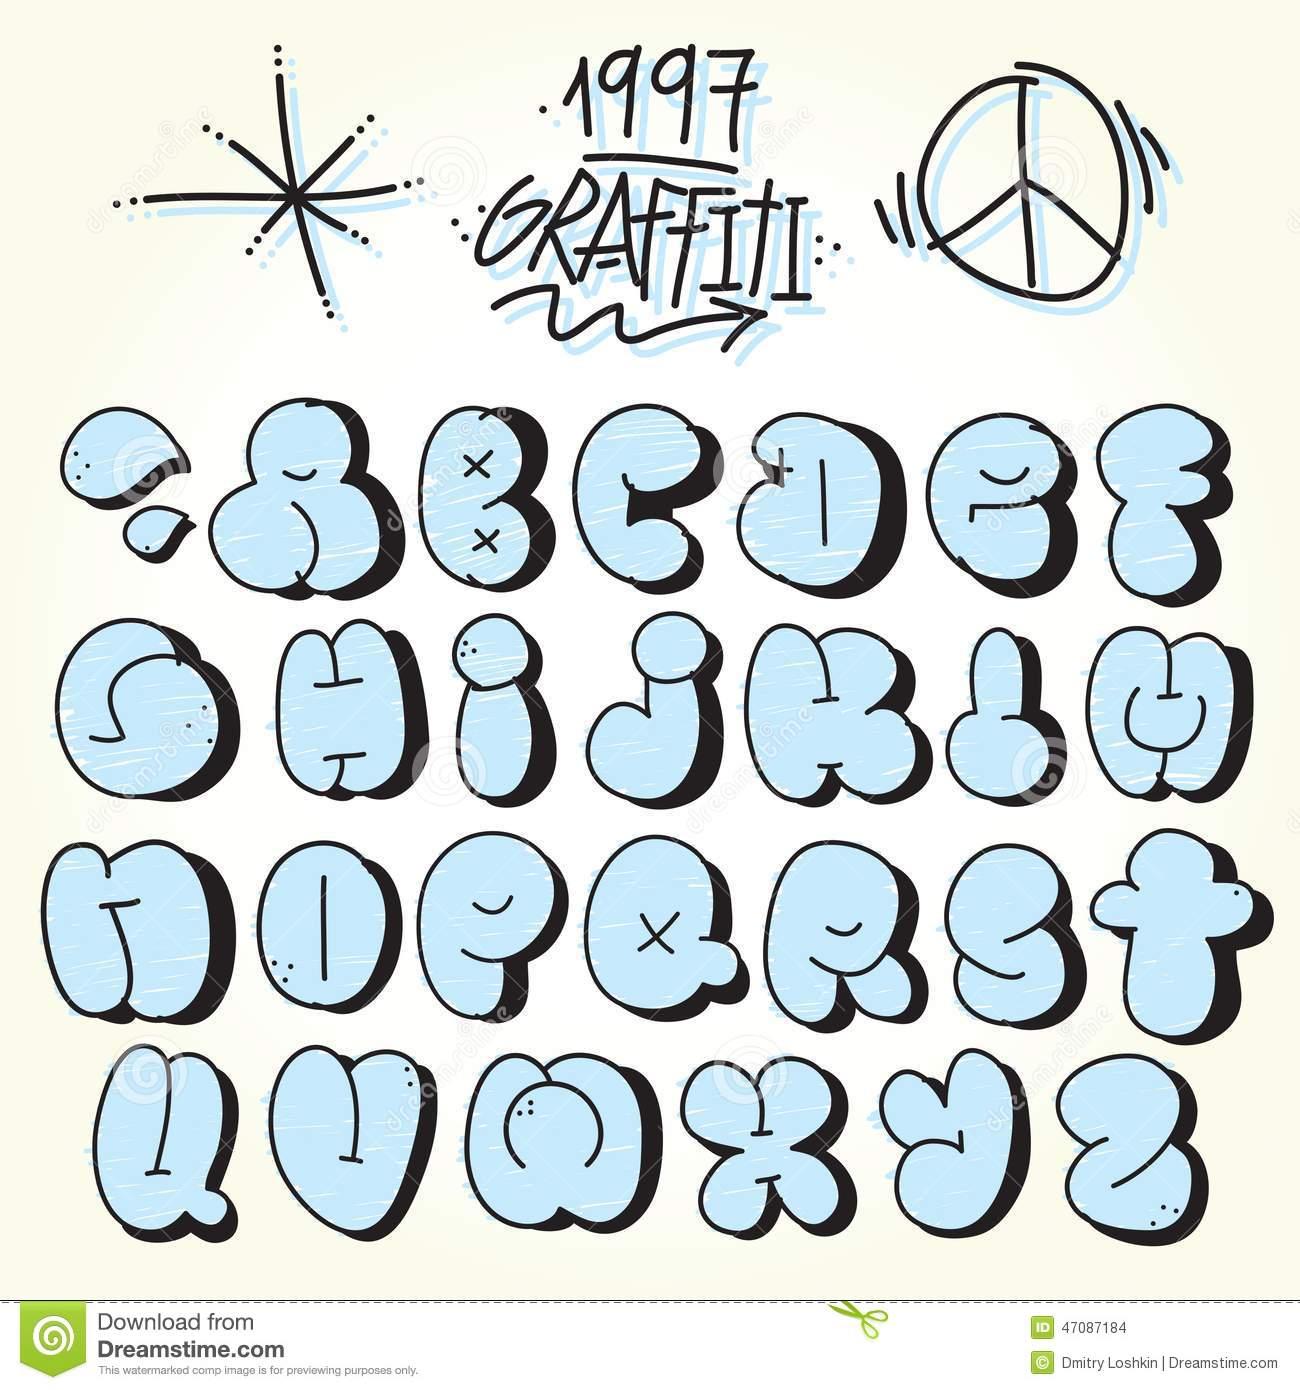 Bubble Graffiti Font Downloads